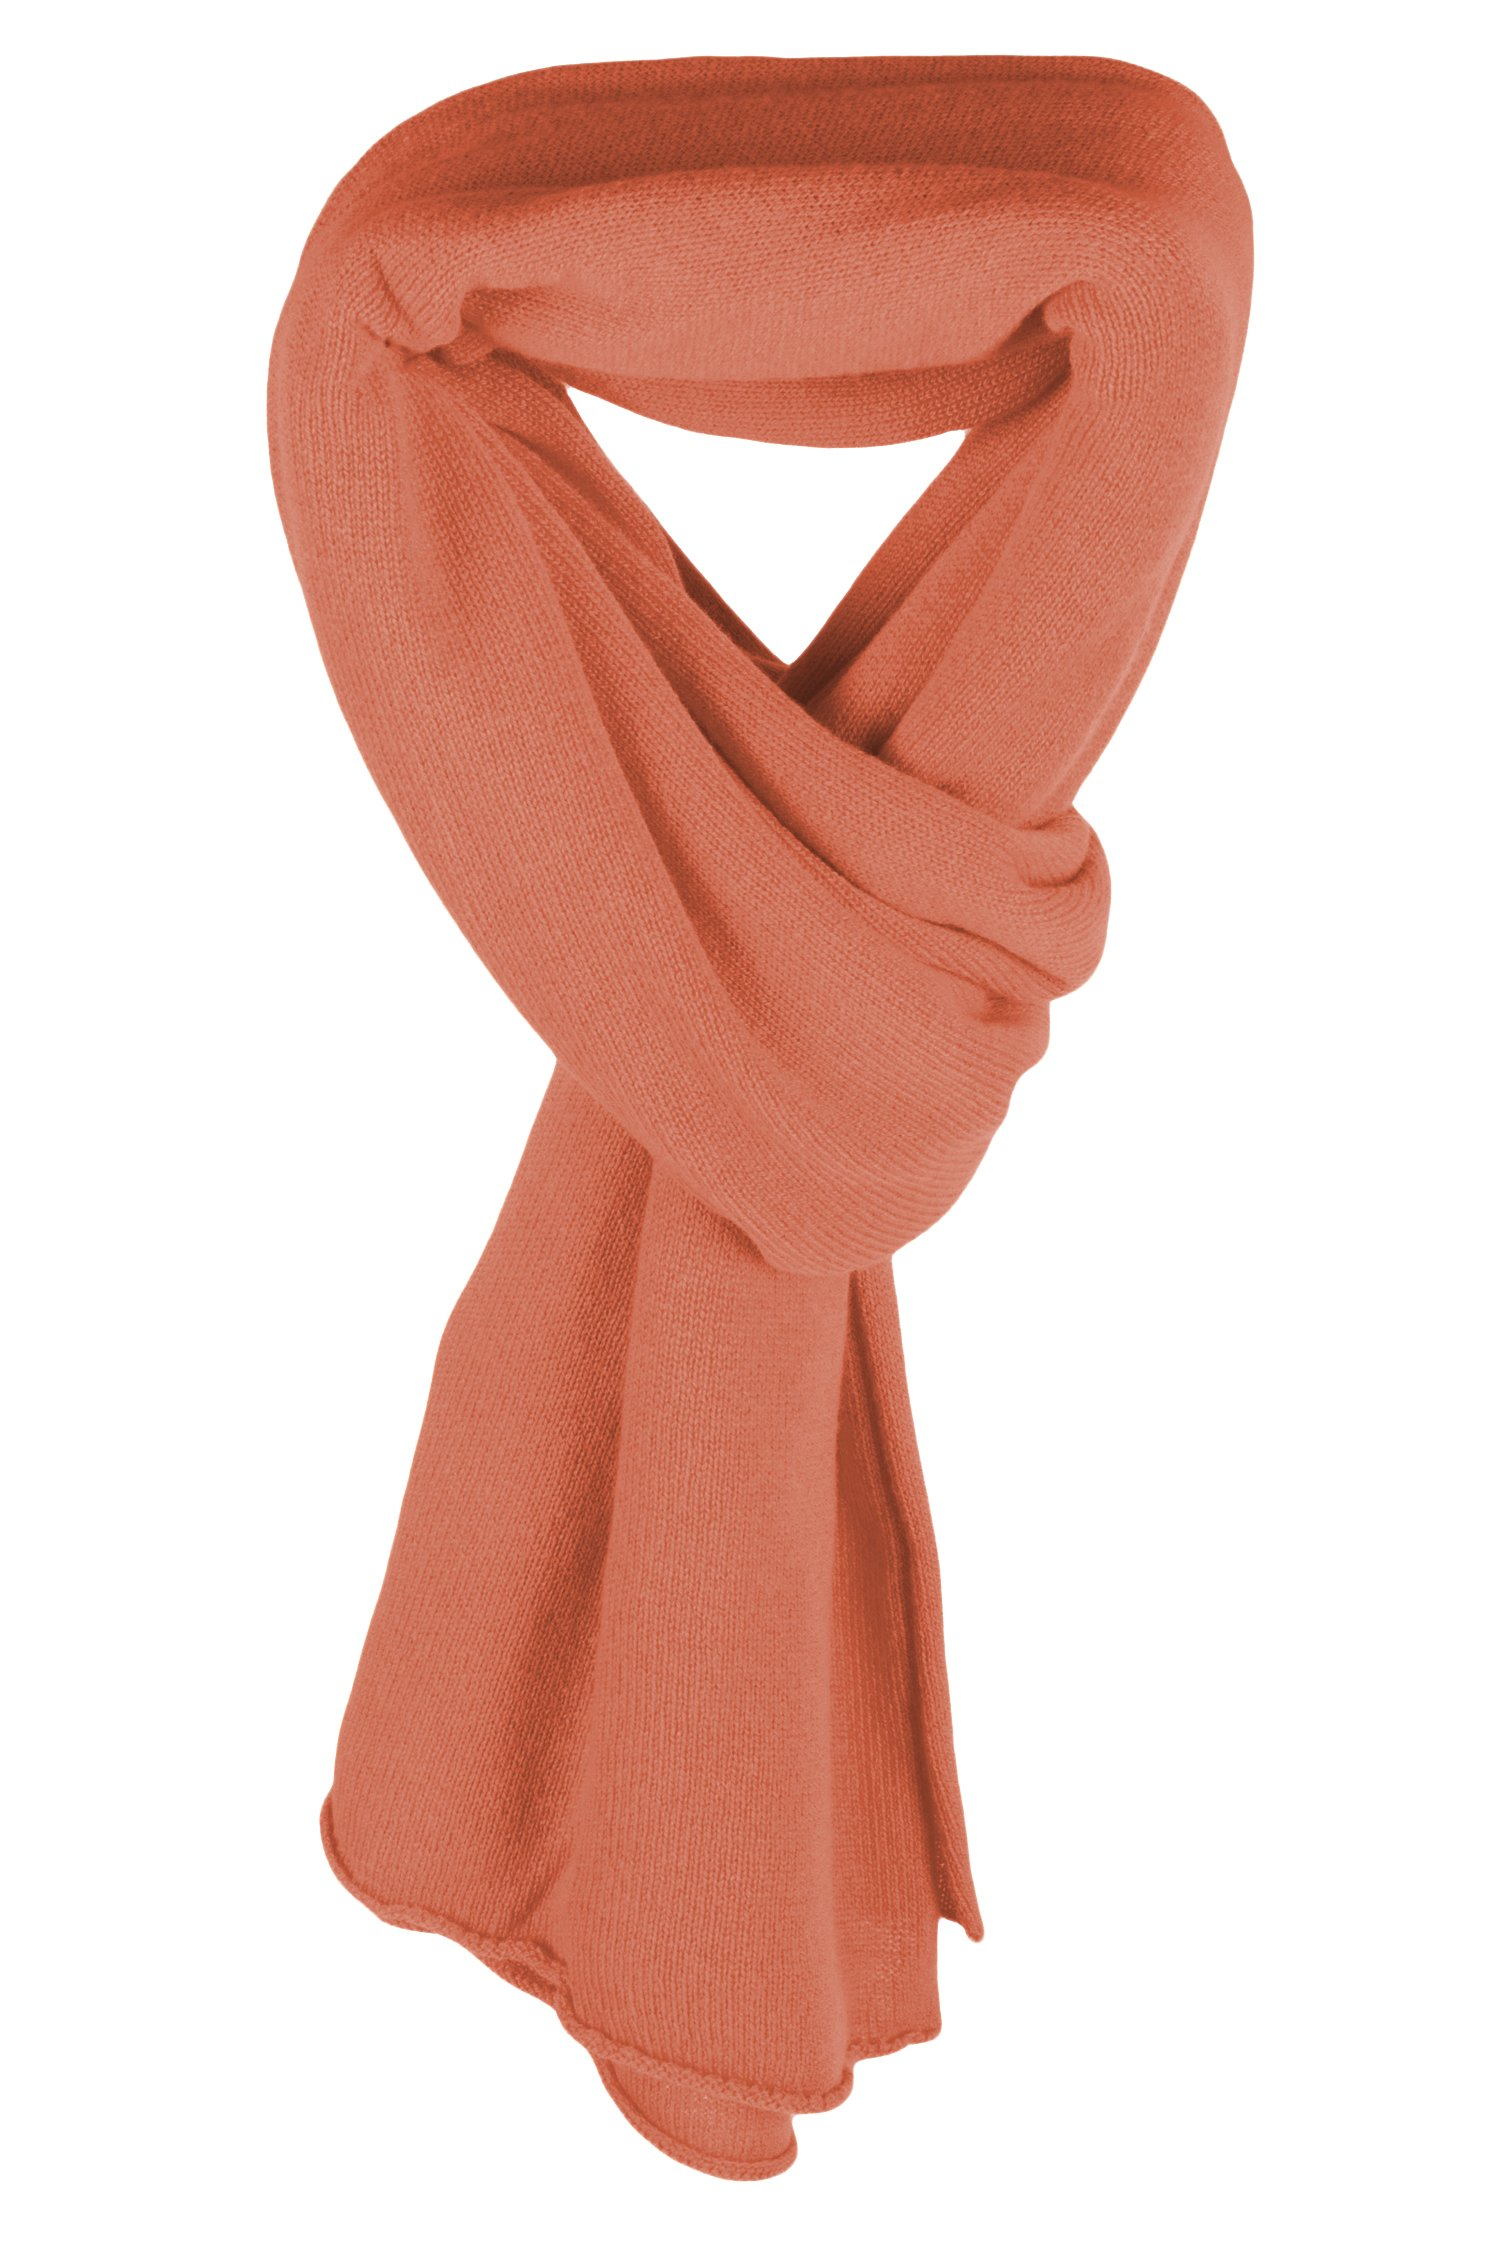 Ladies Ultrafine 100% Cashmere Scarf Wrap - Peach Orange - made in Scotland by Love Cashmere RRP $400